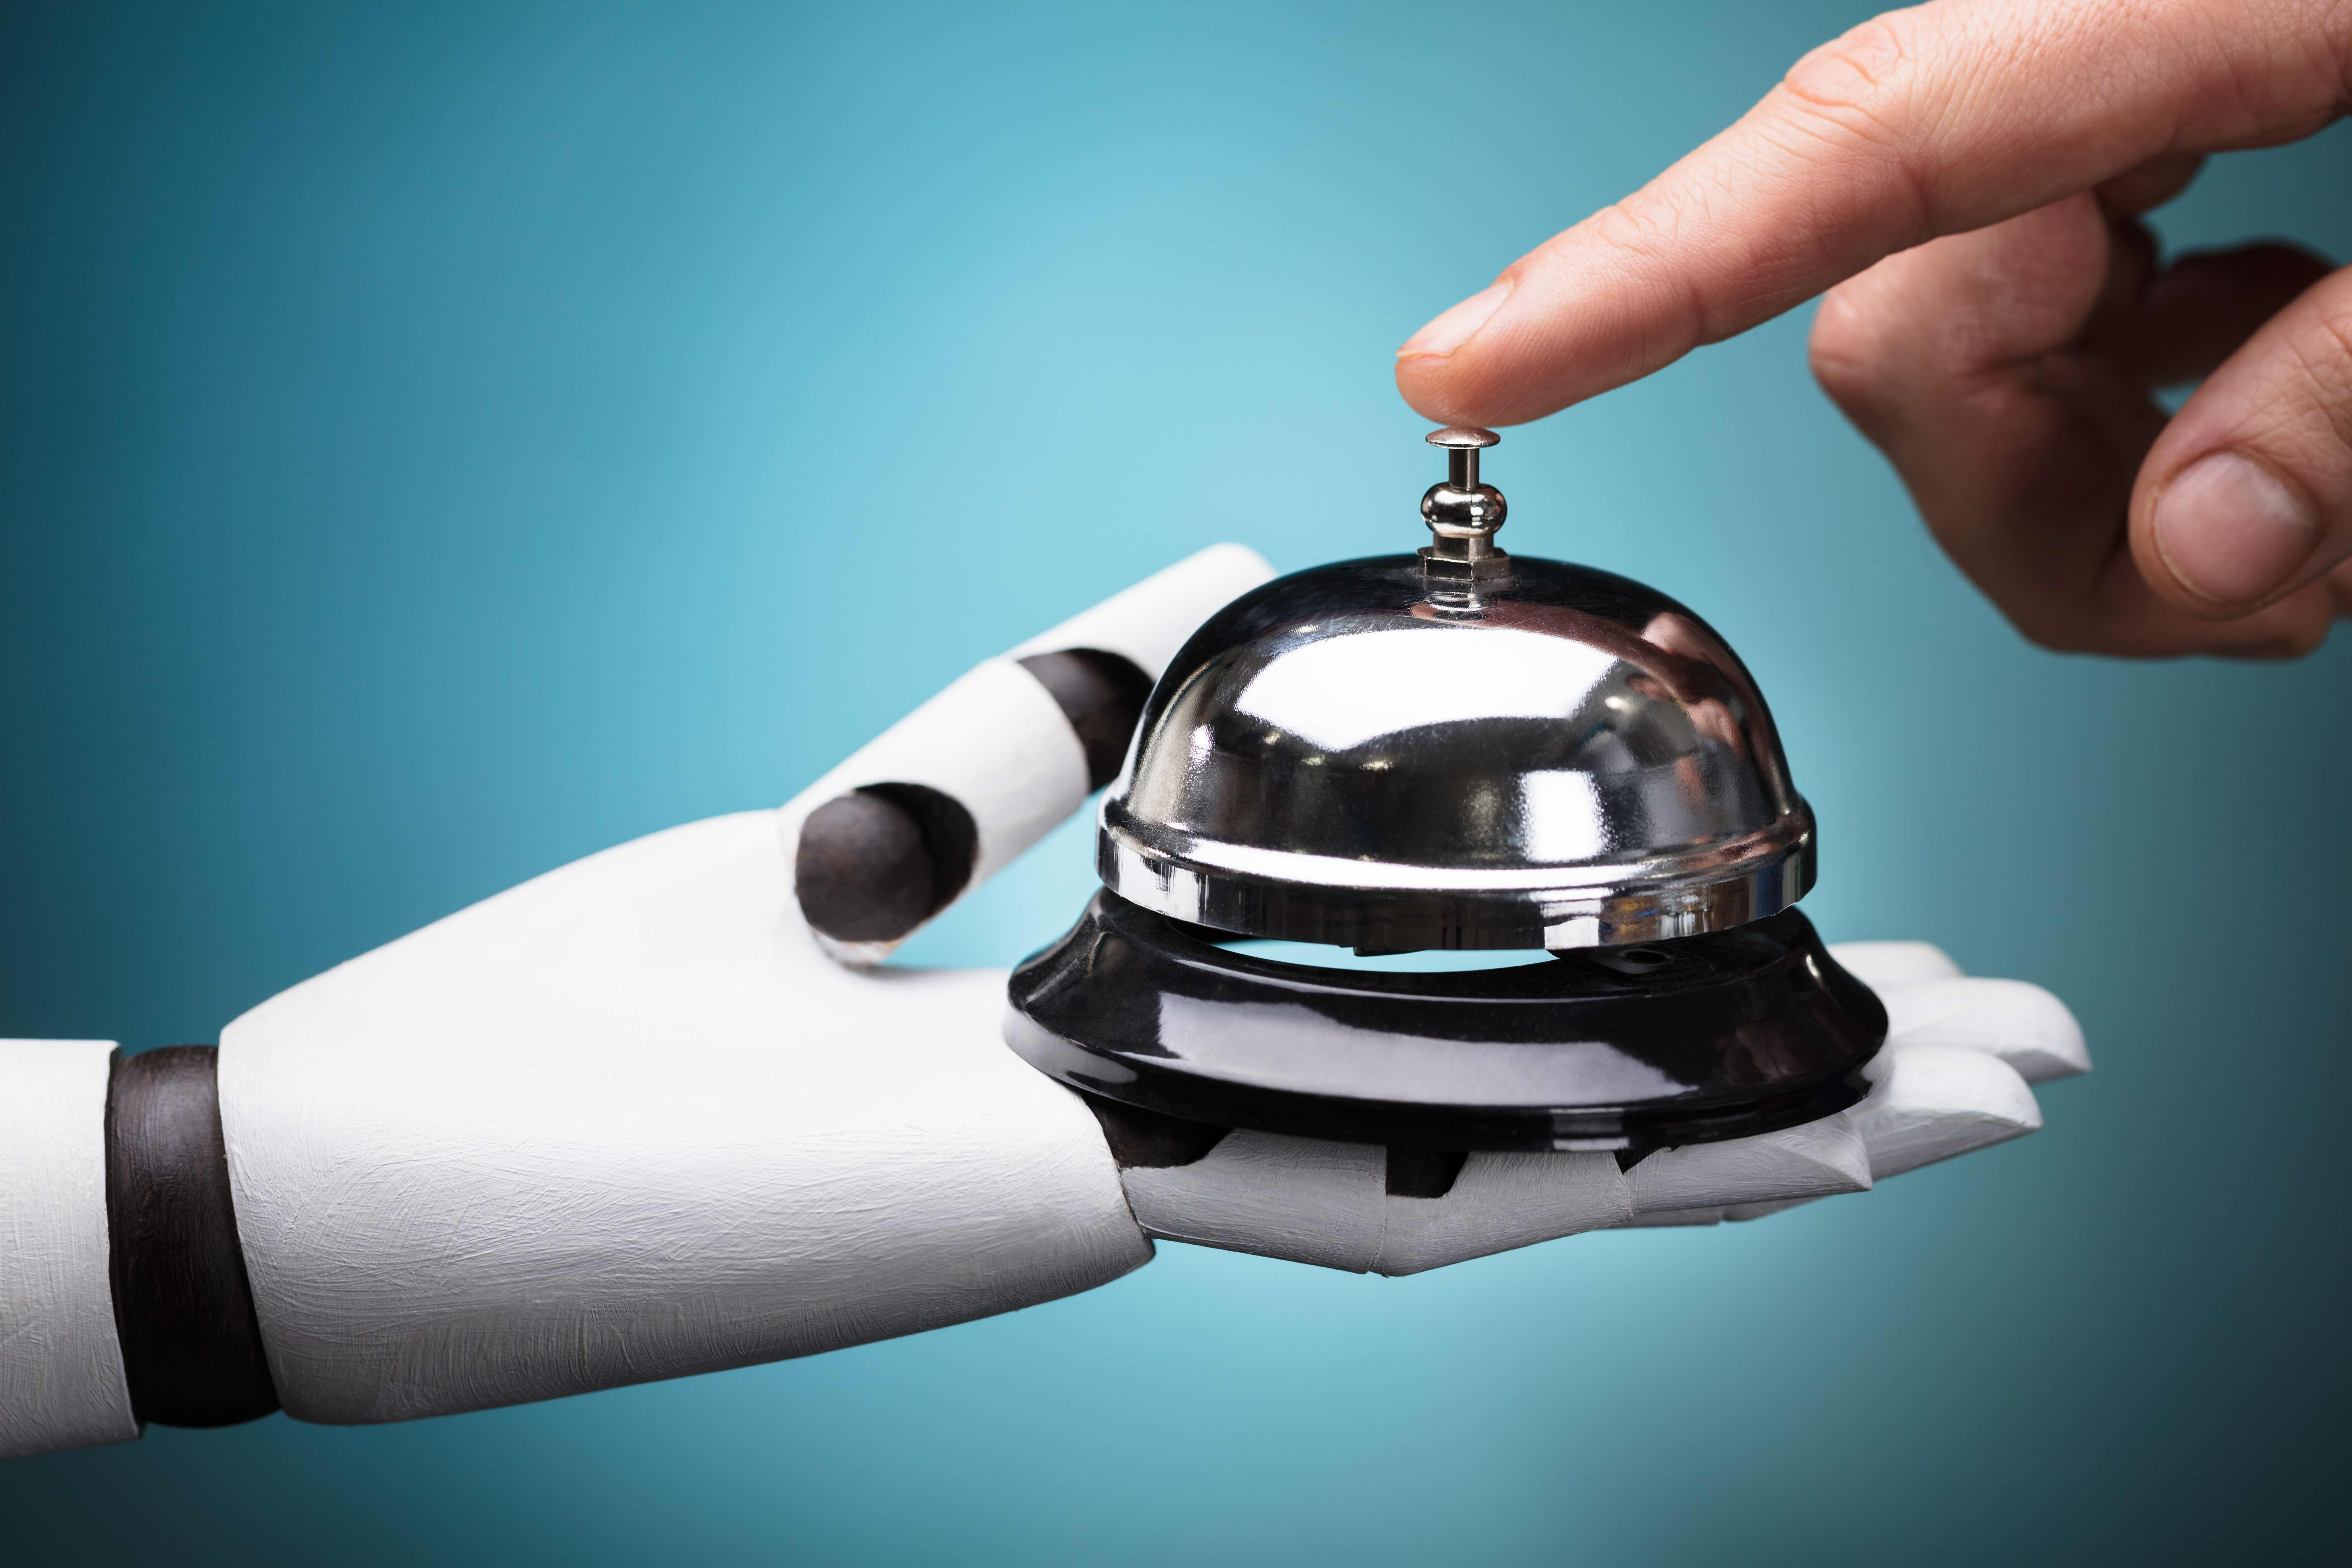 Hospitality Technology Next Generation